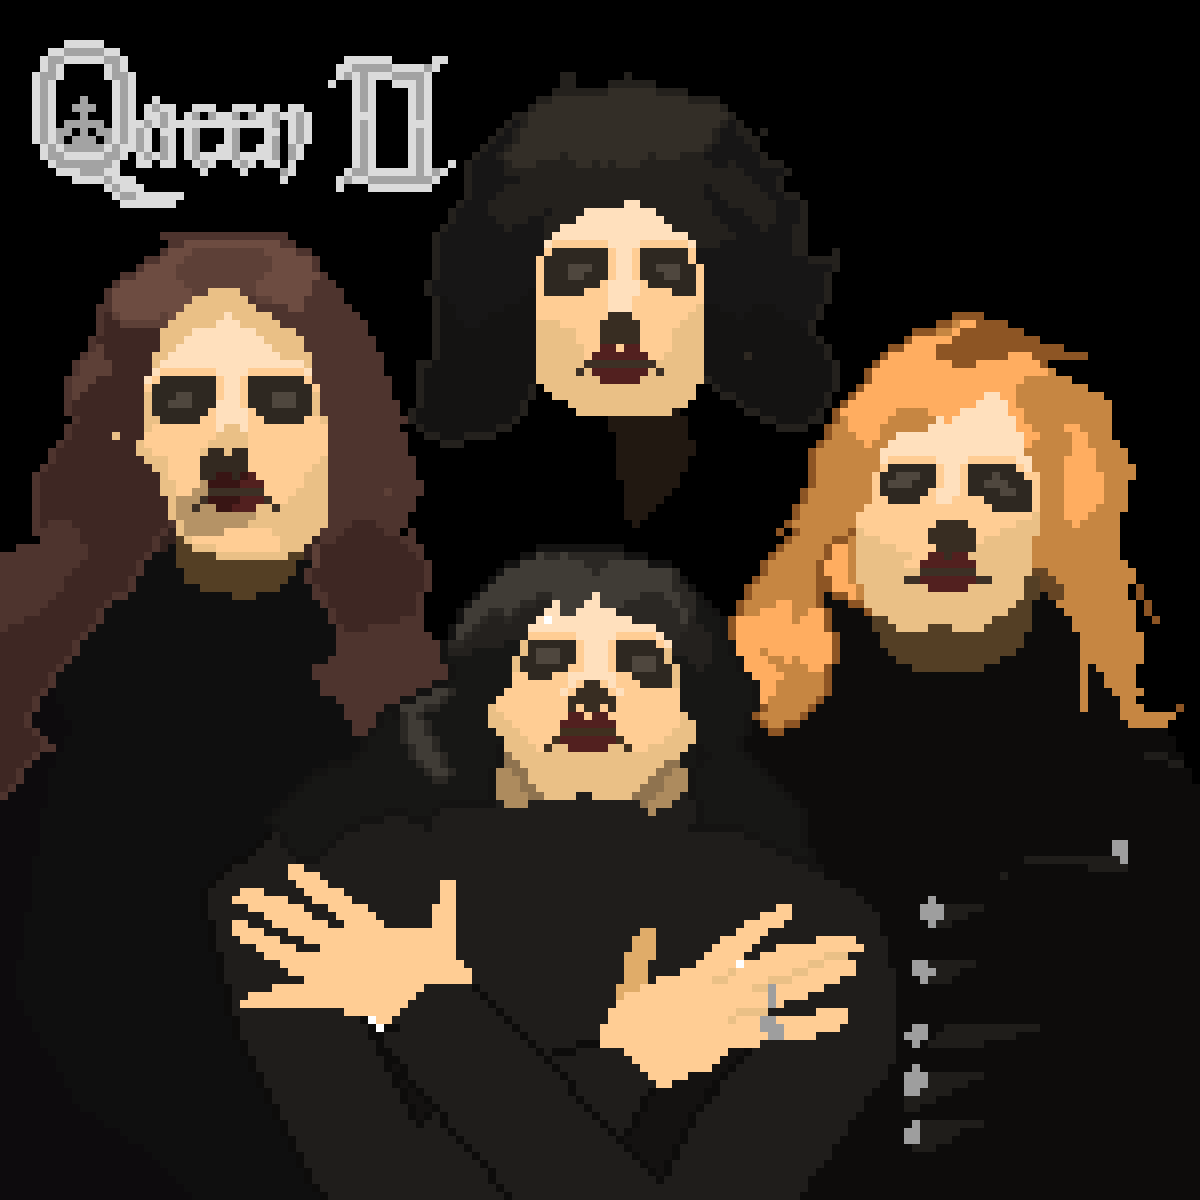 Pixilart - 8-Bit Queen 2 album cover by OreoMikeyKing50